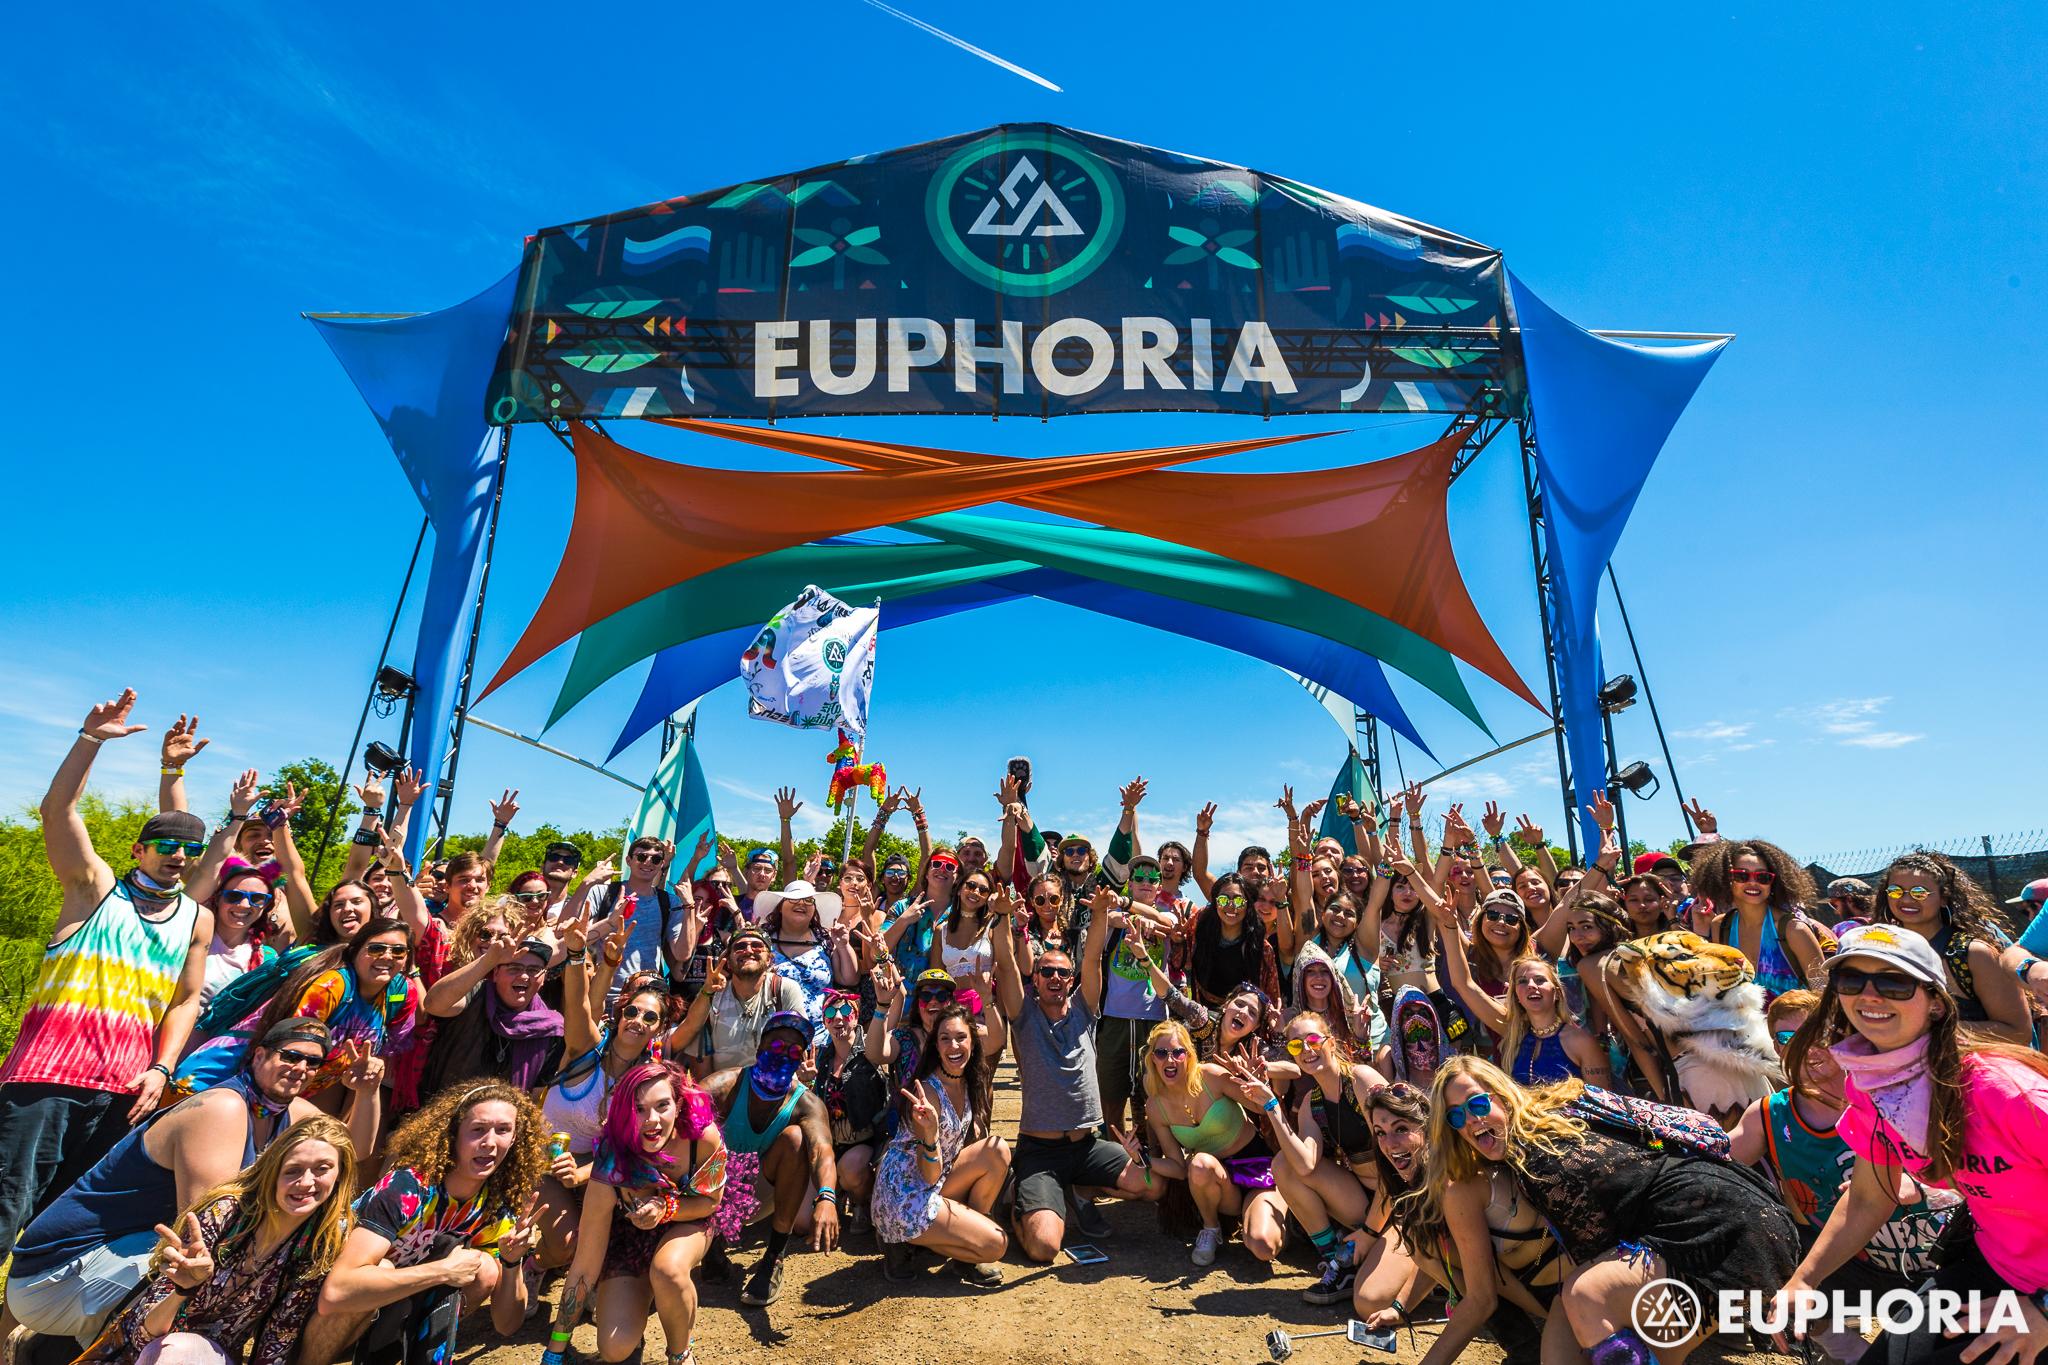 Euphoria2017_0407_141850-0394_AGP.jpg